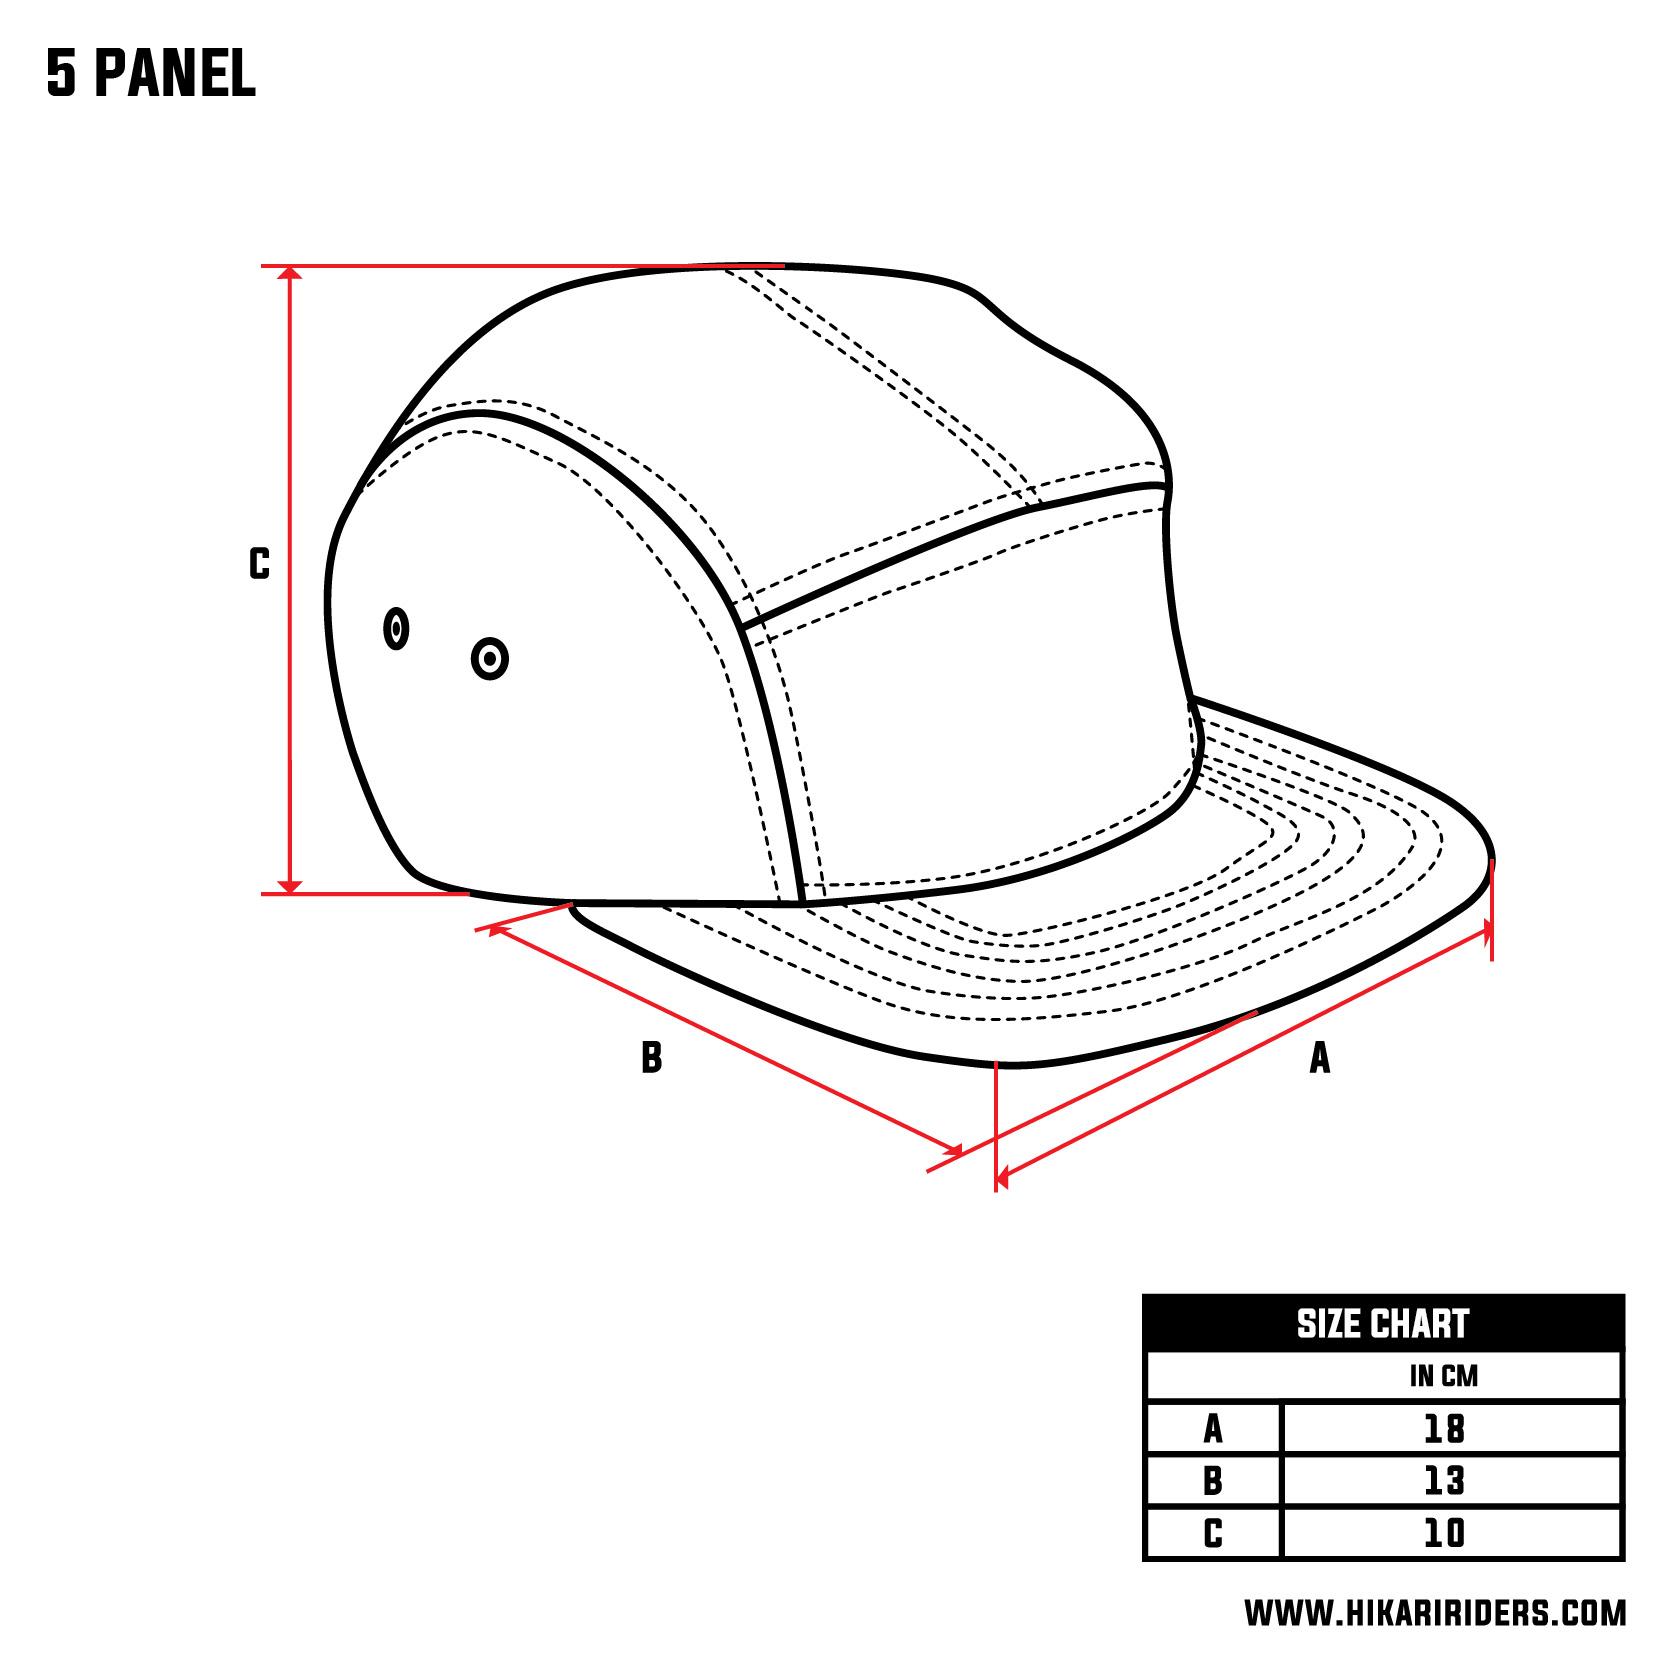 5 Panel.jpg